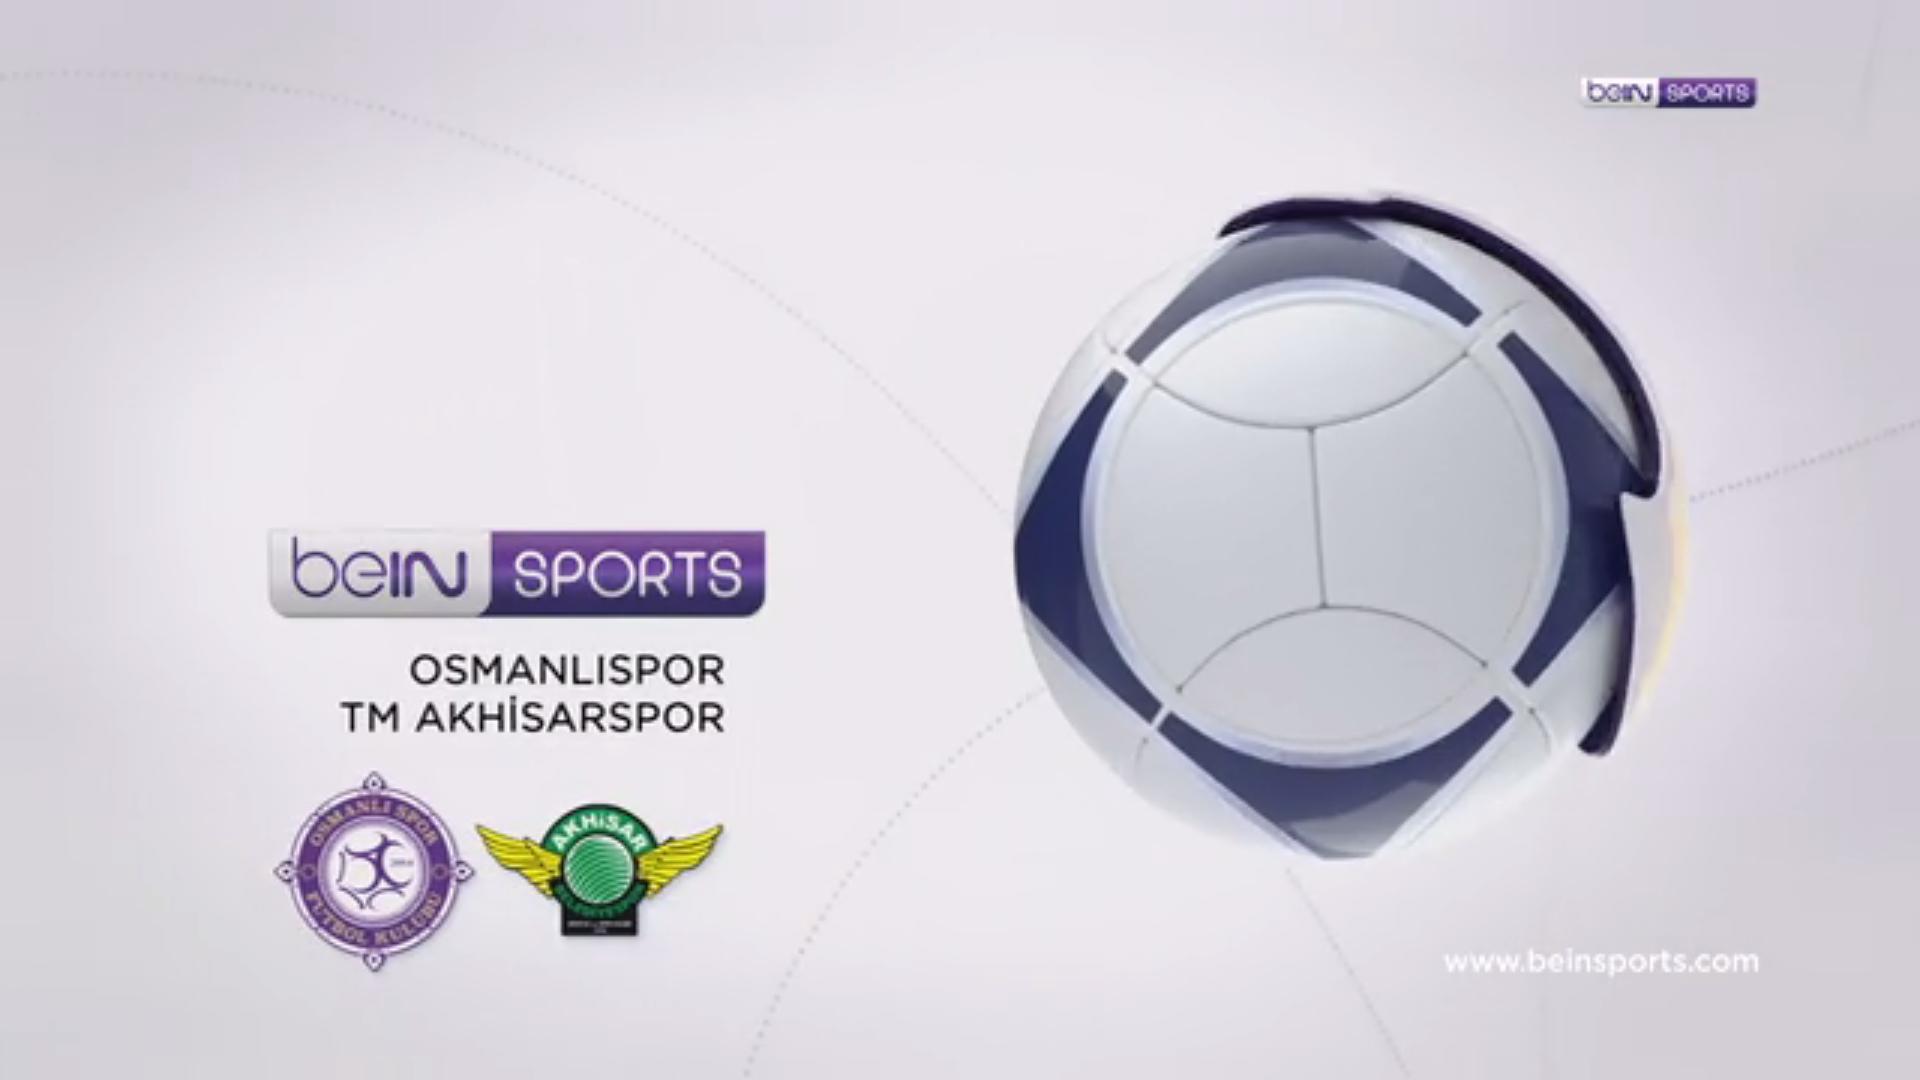 25-12-2017 - Osmanlispor FK 3-2 Akhisar Belediye Genclik Ve Spor